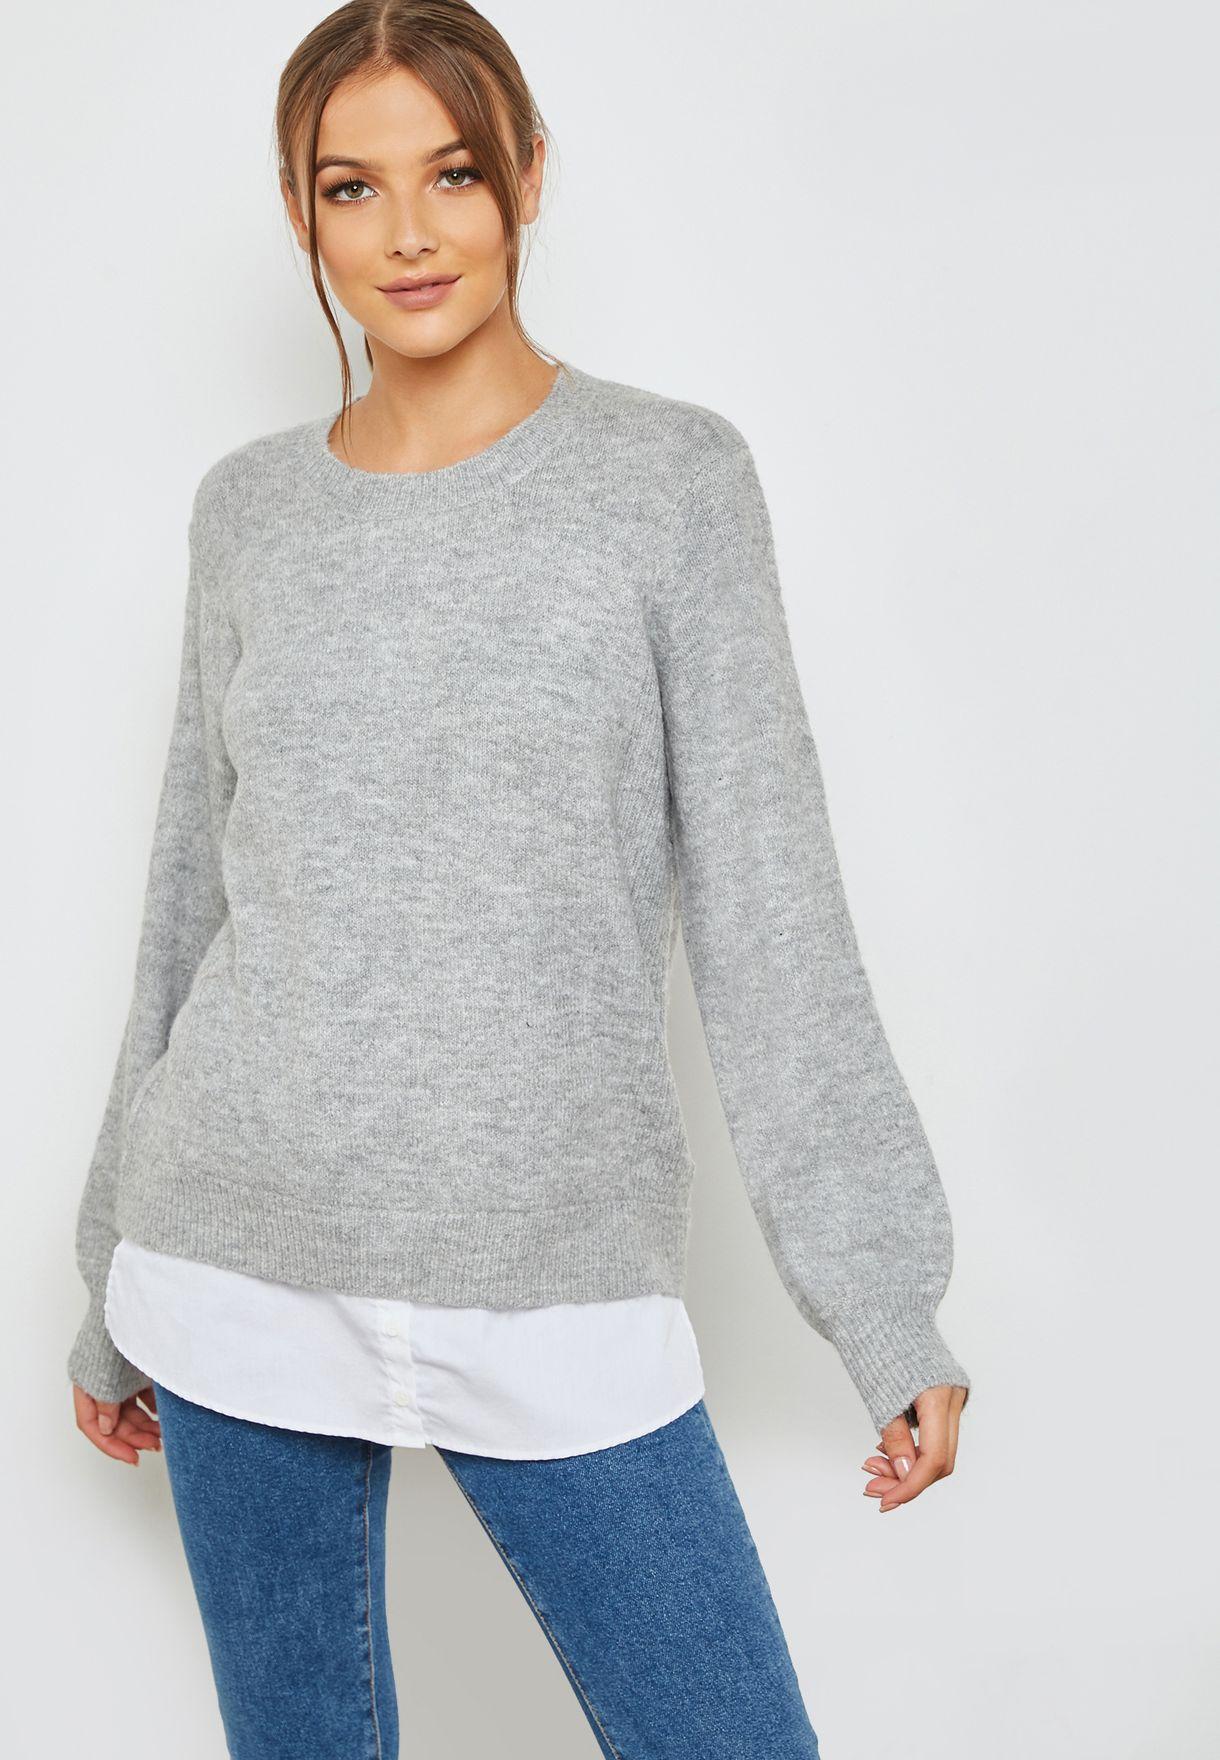 c4ffe5df68b Shop Dorothy Perkins grey Tie Back 2 In 1 Sweater 55448020 for Women ...